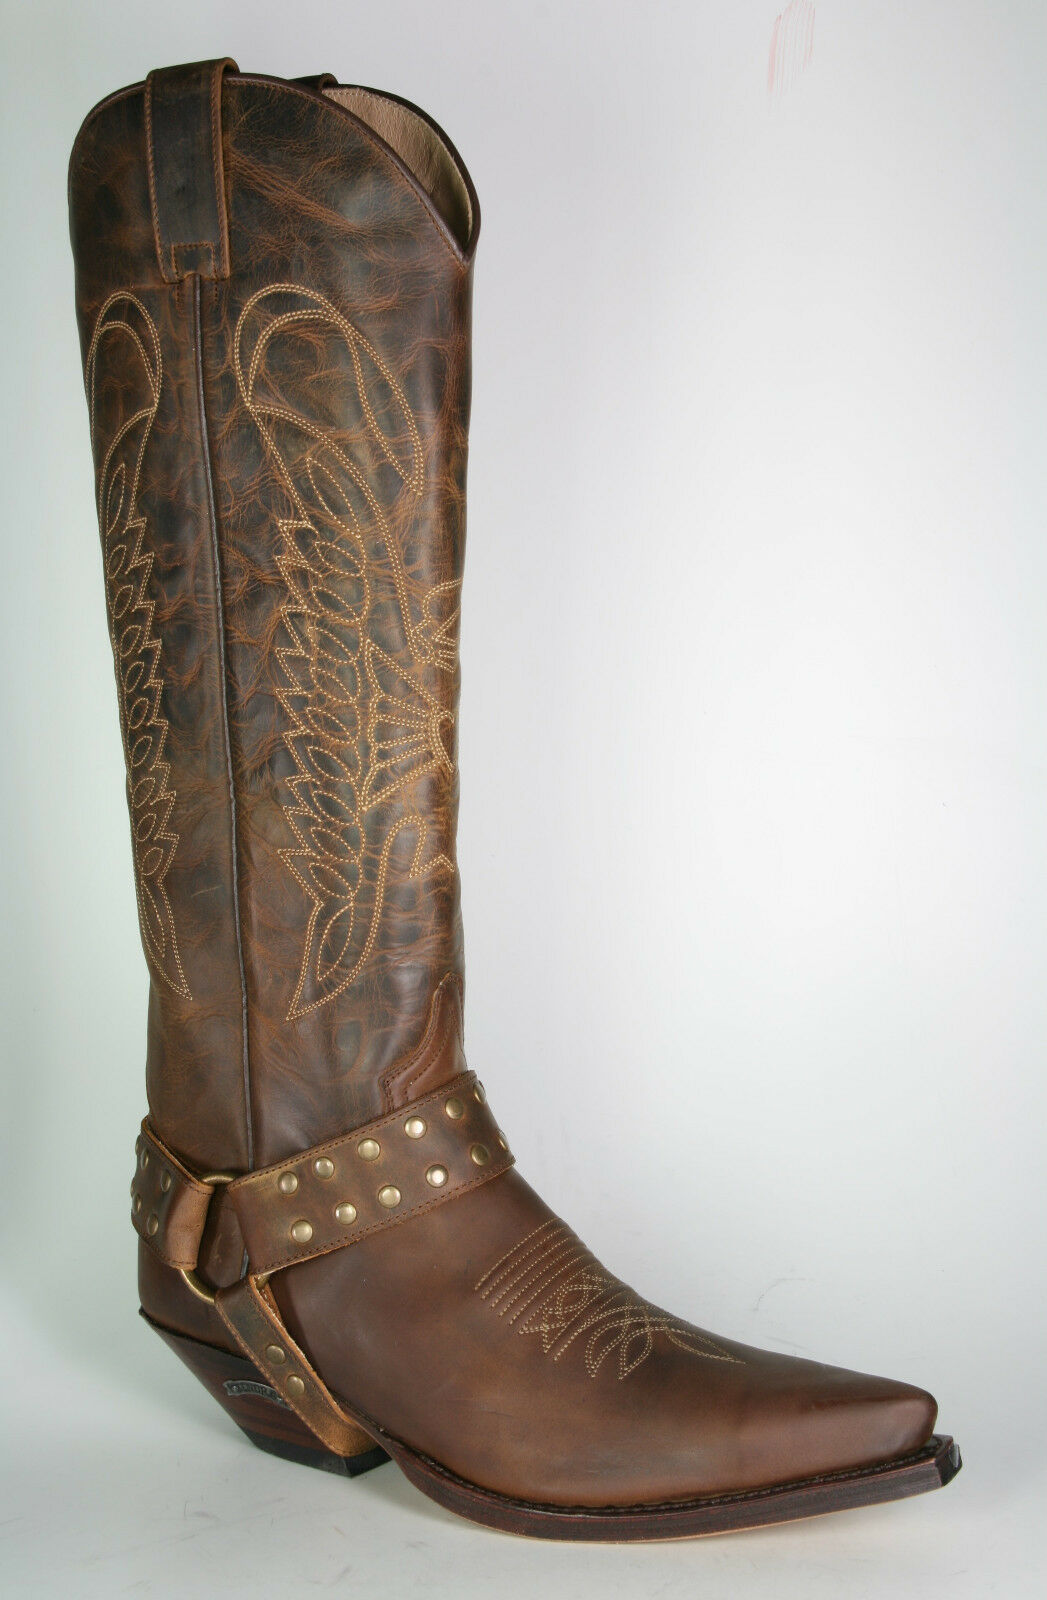 7167 sendra bottes de cowboy hochschaft Mad Dog tang Marron Cadre cousue Chaussures